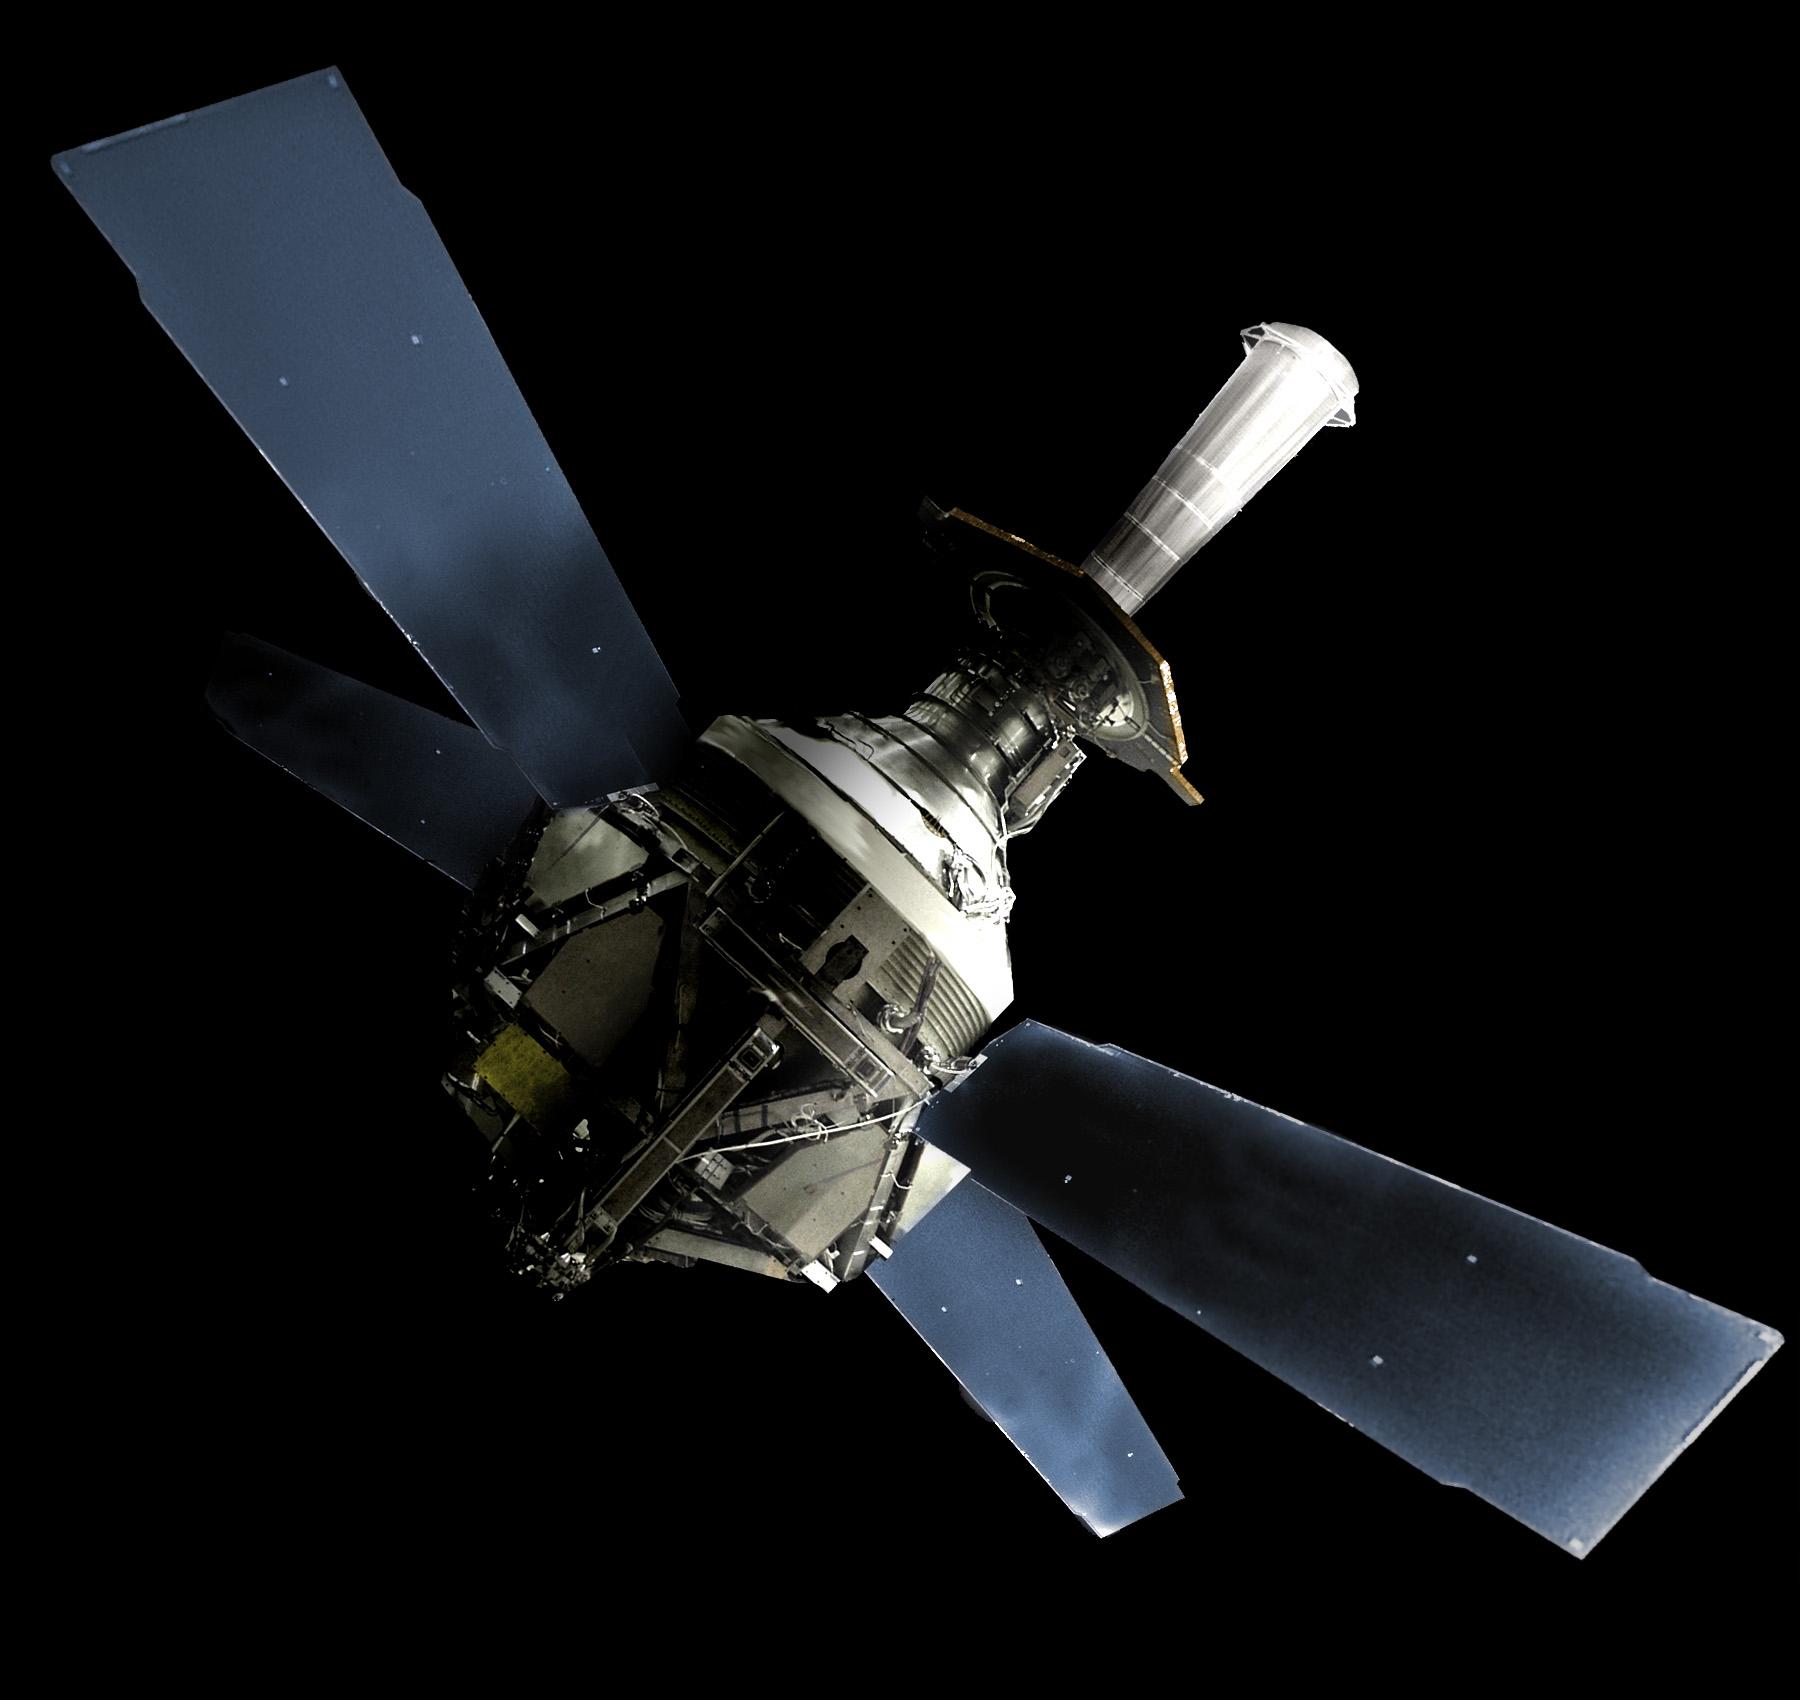 nasa space probes - photo #5